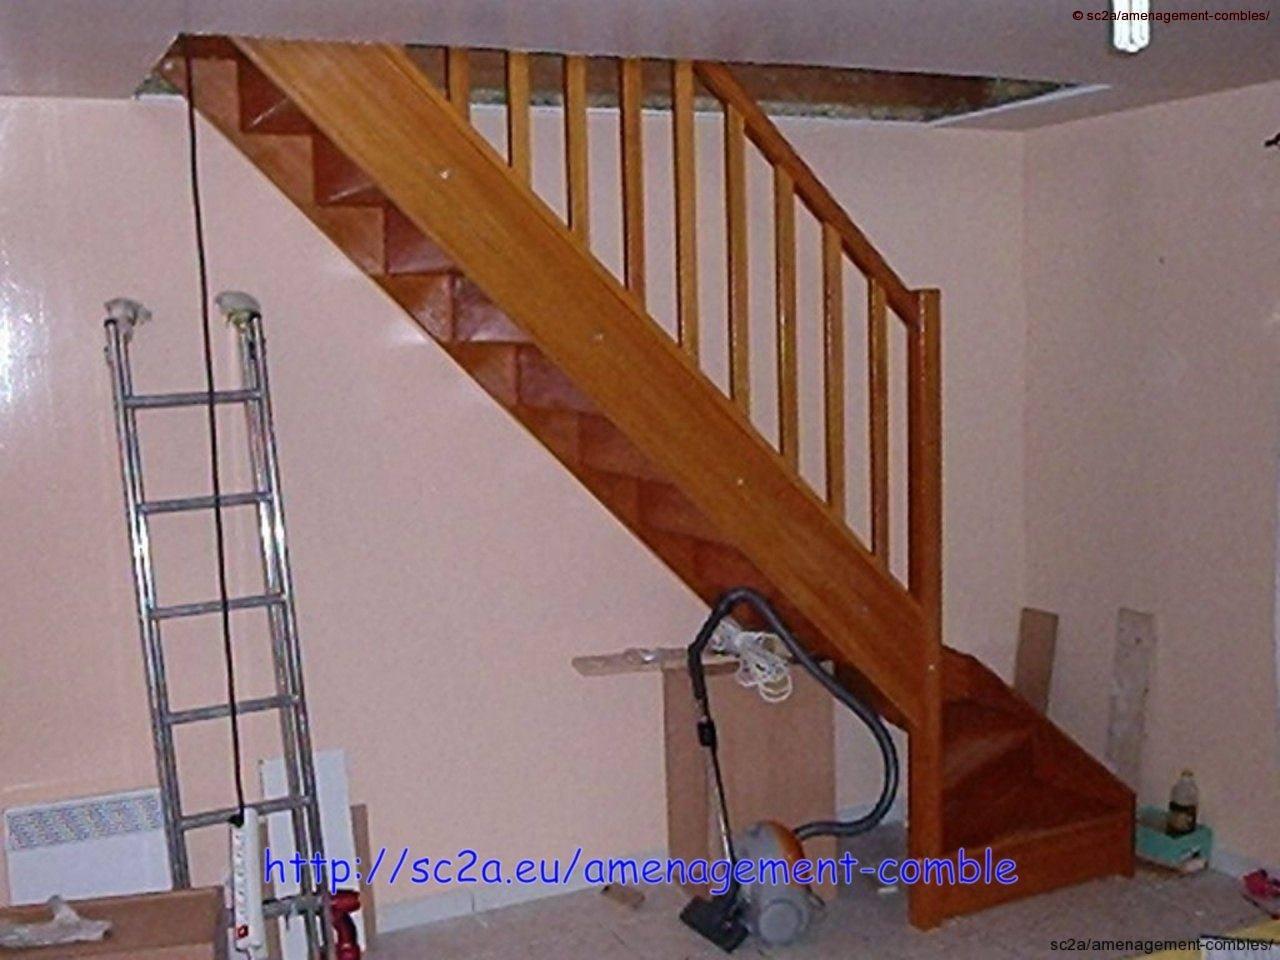 escalier en kit trendy escalier suspendu en kit with escalier en kit free escalier en kit. Black Bedroom Furniture Sets. Home Design Ideas